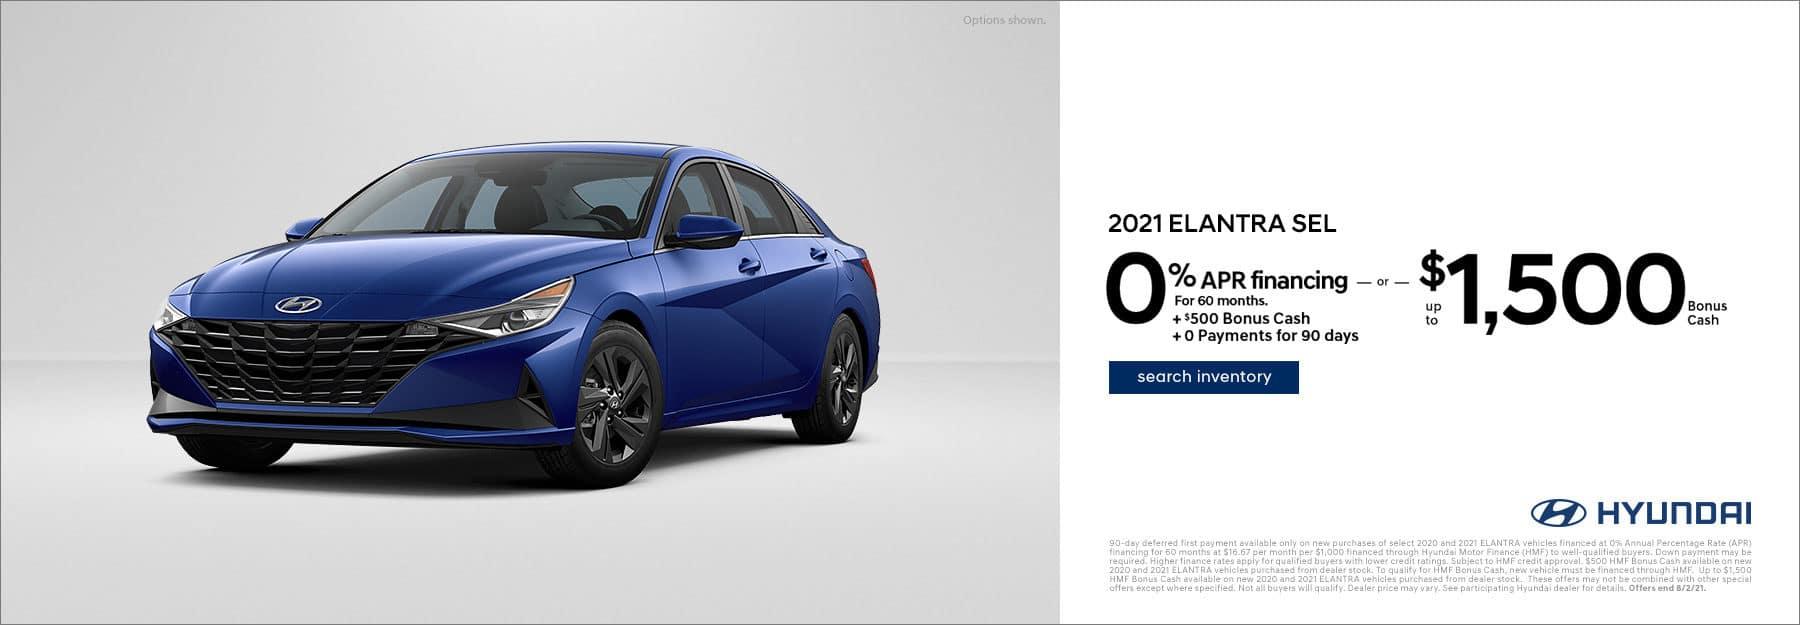 2021 Elantra/Sonata - 0% APR + 1000 Back - June - East